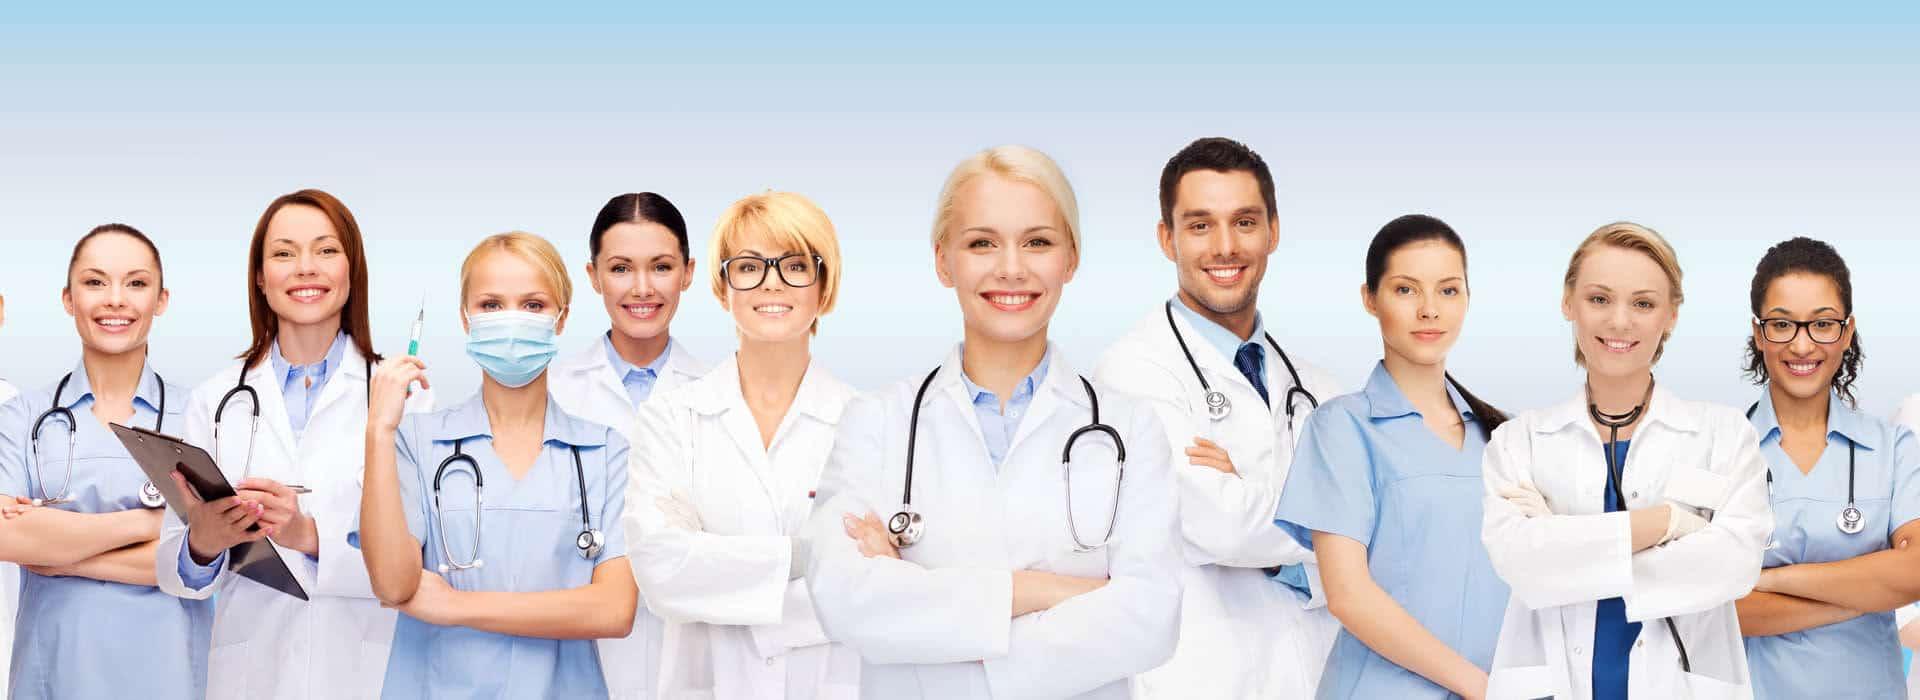 Test ammissione Medicina